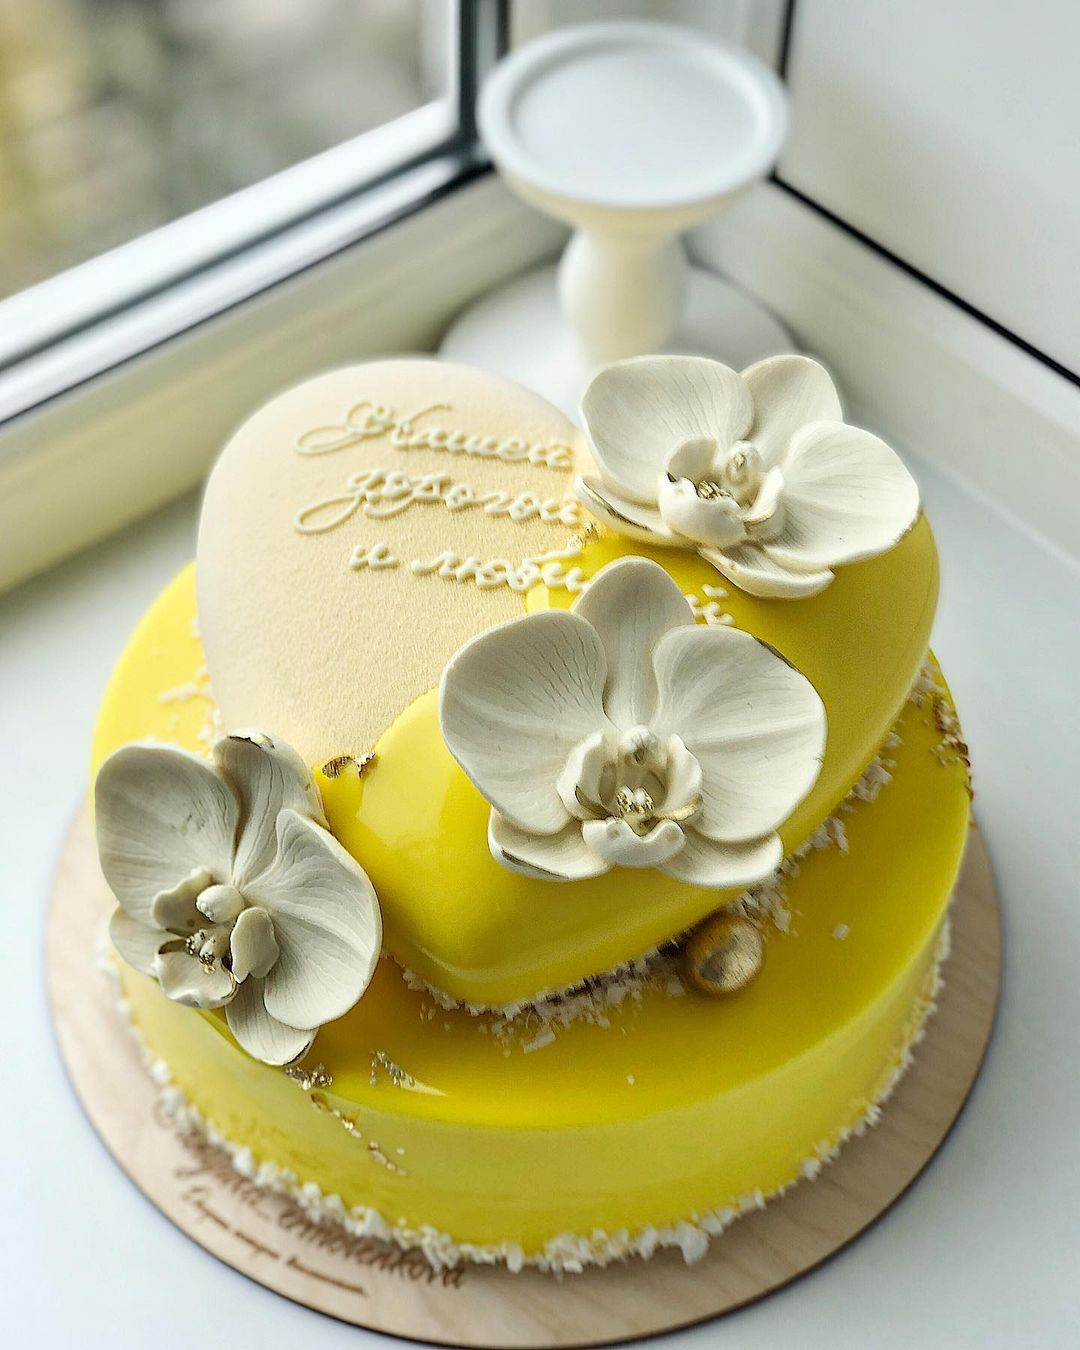 Lemon floral cake